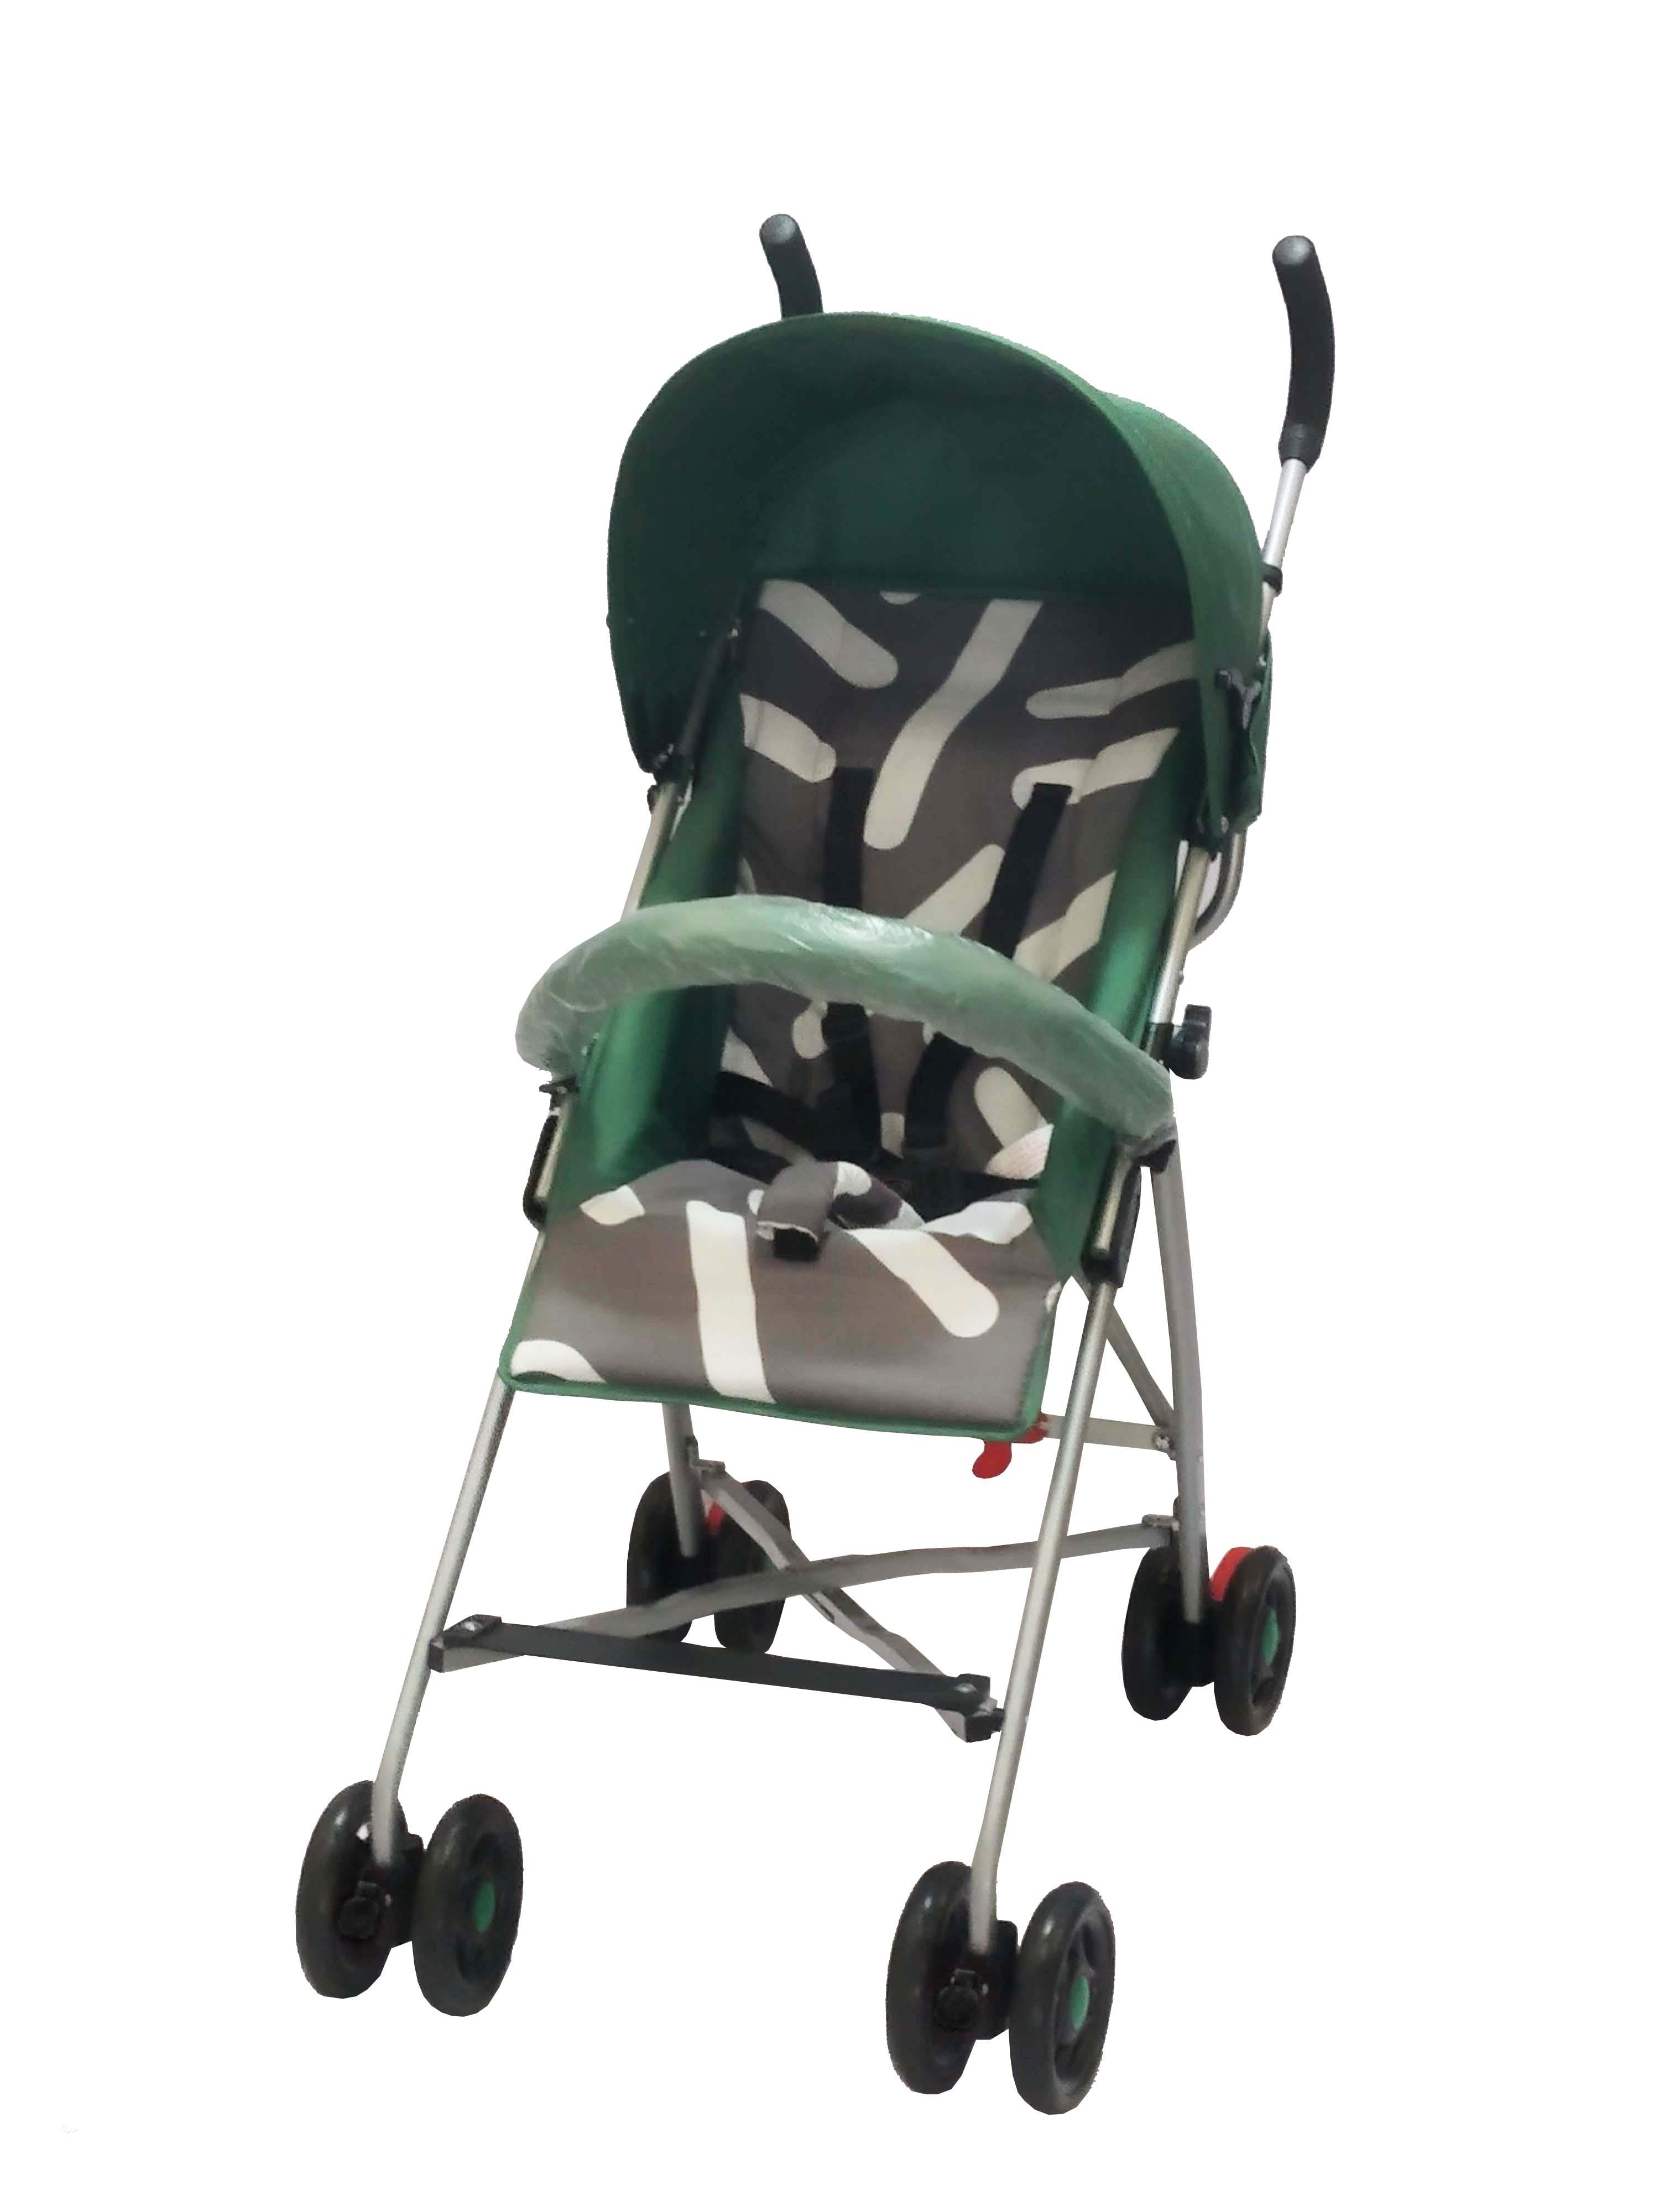 Прогулочная коляска Parusok Evo Pro зеленый